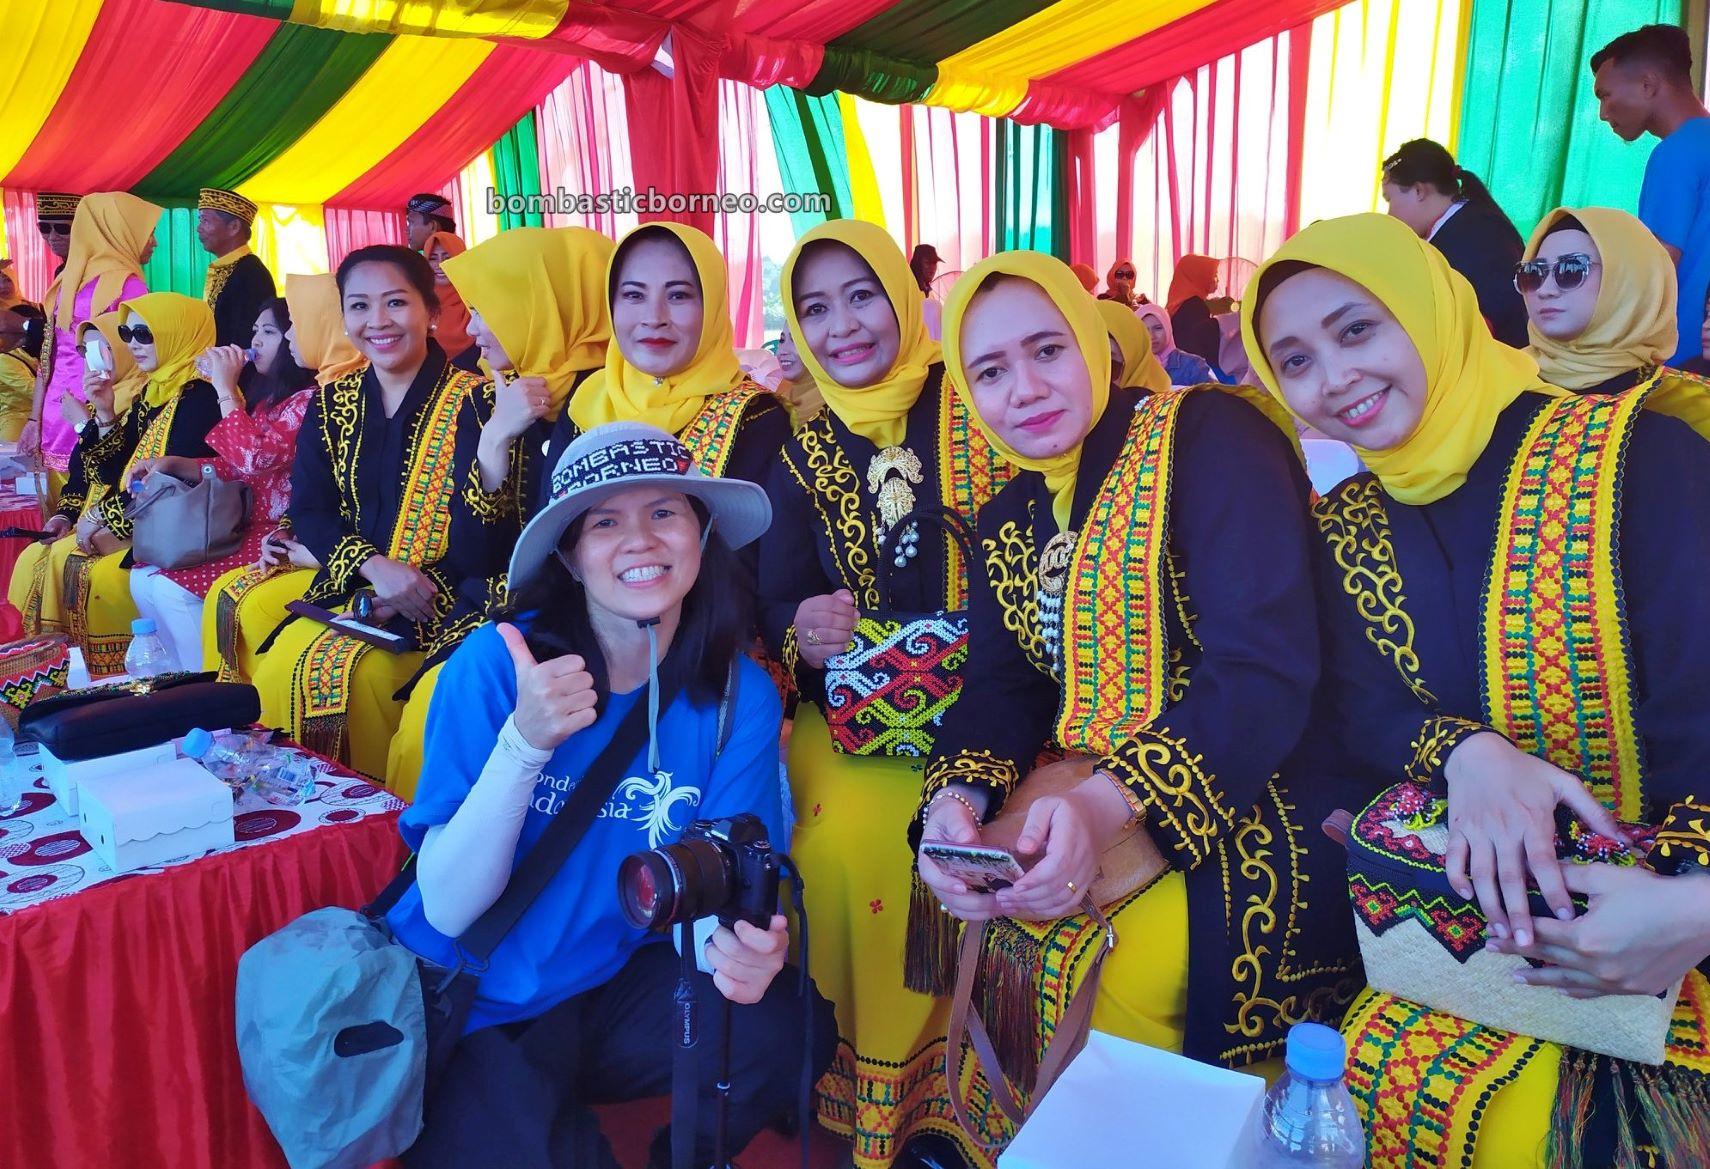 Festival Iraw Tengkayu, Suku Dayak Tidung, indigenous, culture, event, Ethnic, native, tribe, Indonesia, Kalimantan Utara, Tarakan, Pariwisata, Tourism, travel guide, Borneo,